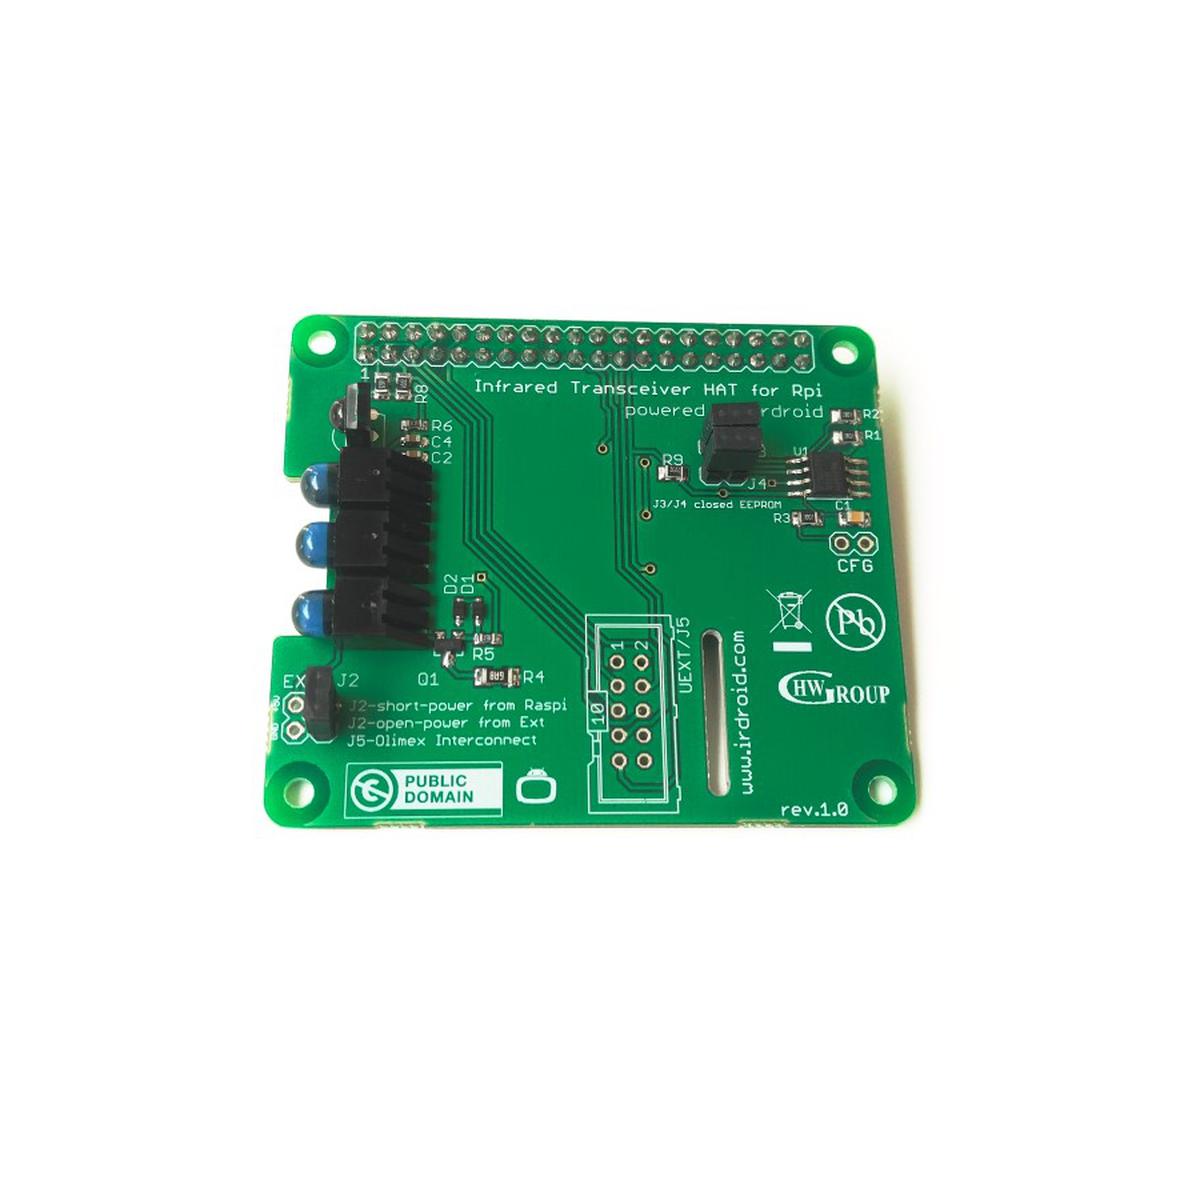 Irdroid-Rpi Infrared Transceiver for Raspberry Pi from